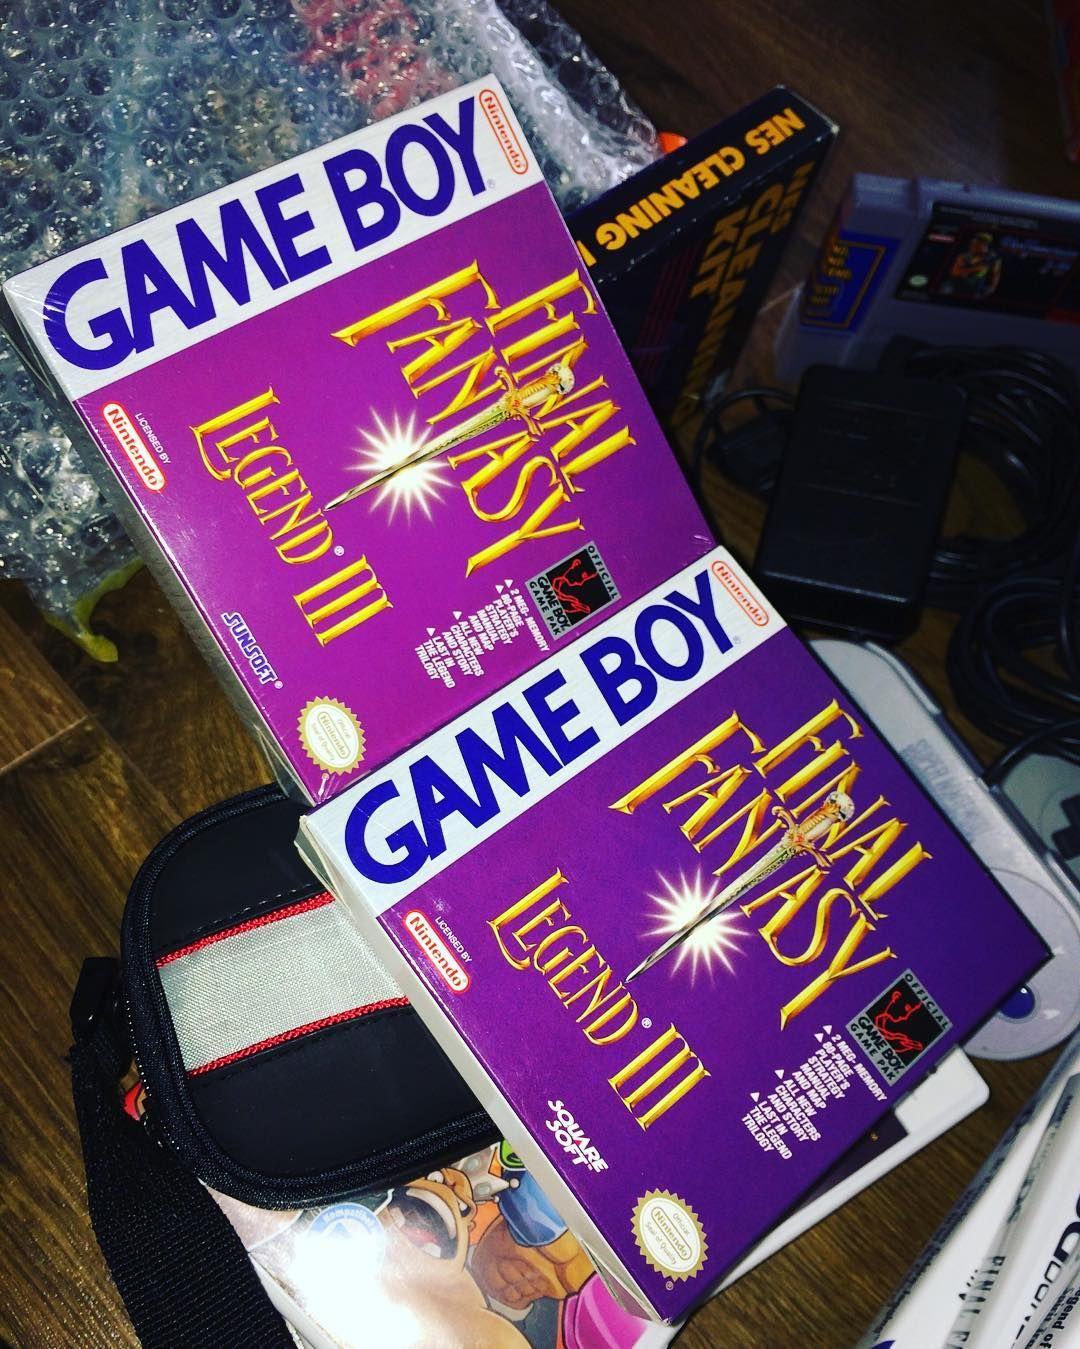 Interesting one by tiger_uppercut_777 #neogeo #microhobbit (o) http://ift.tt/1XDwyMM #supernintendo #snes #megadrive #sega #mariokart #superfamicom #mario #playstation  #snk #capcom #megaman #retrogames #retro #nintendo #nes #nintendo64 #gamecube #videogames #dreamcast #supermario #playstation3 #marvel  #gameboy #ps4 #ps3 #ps2 #xbox #supermario #boxart